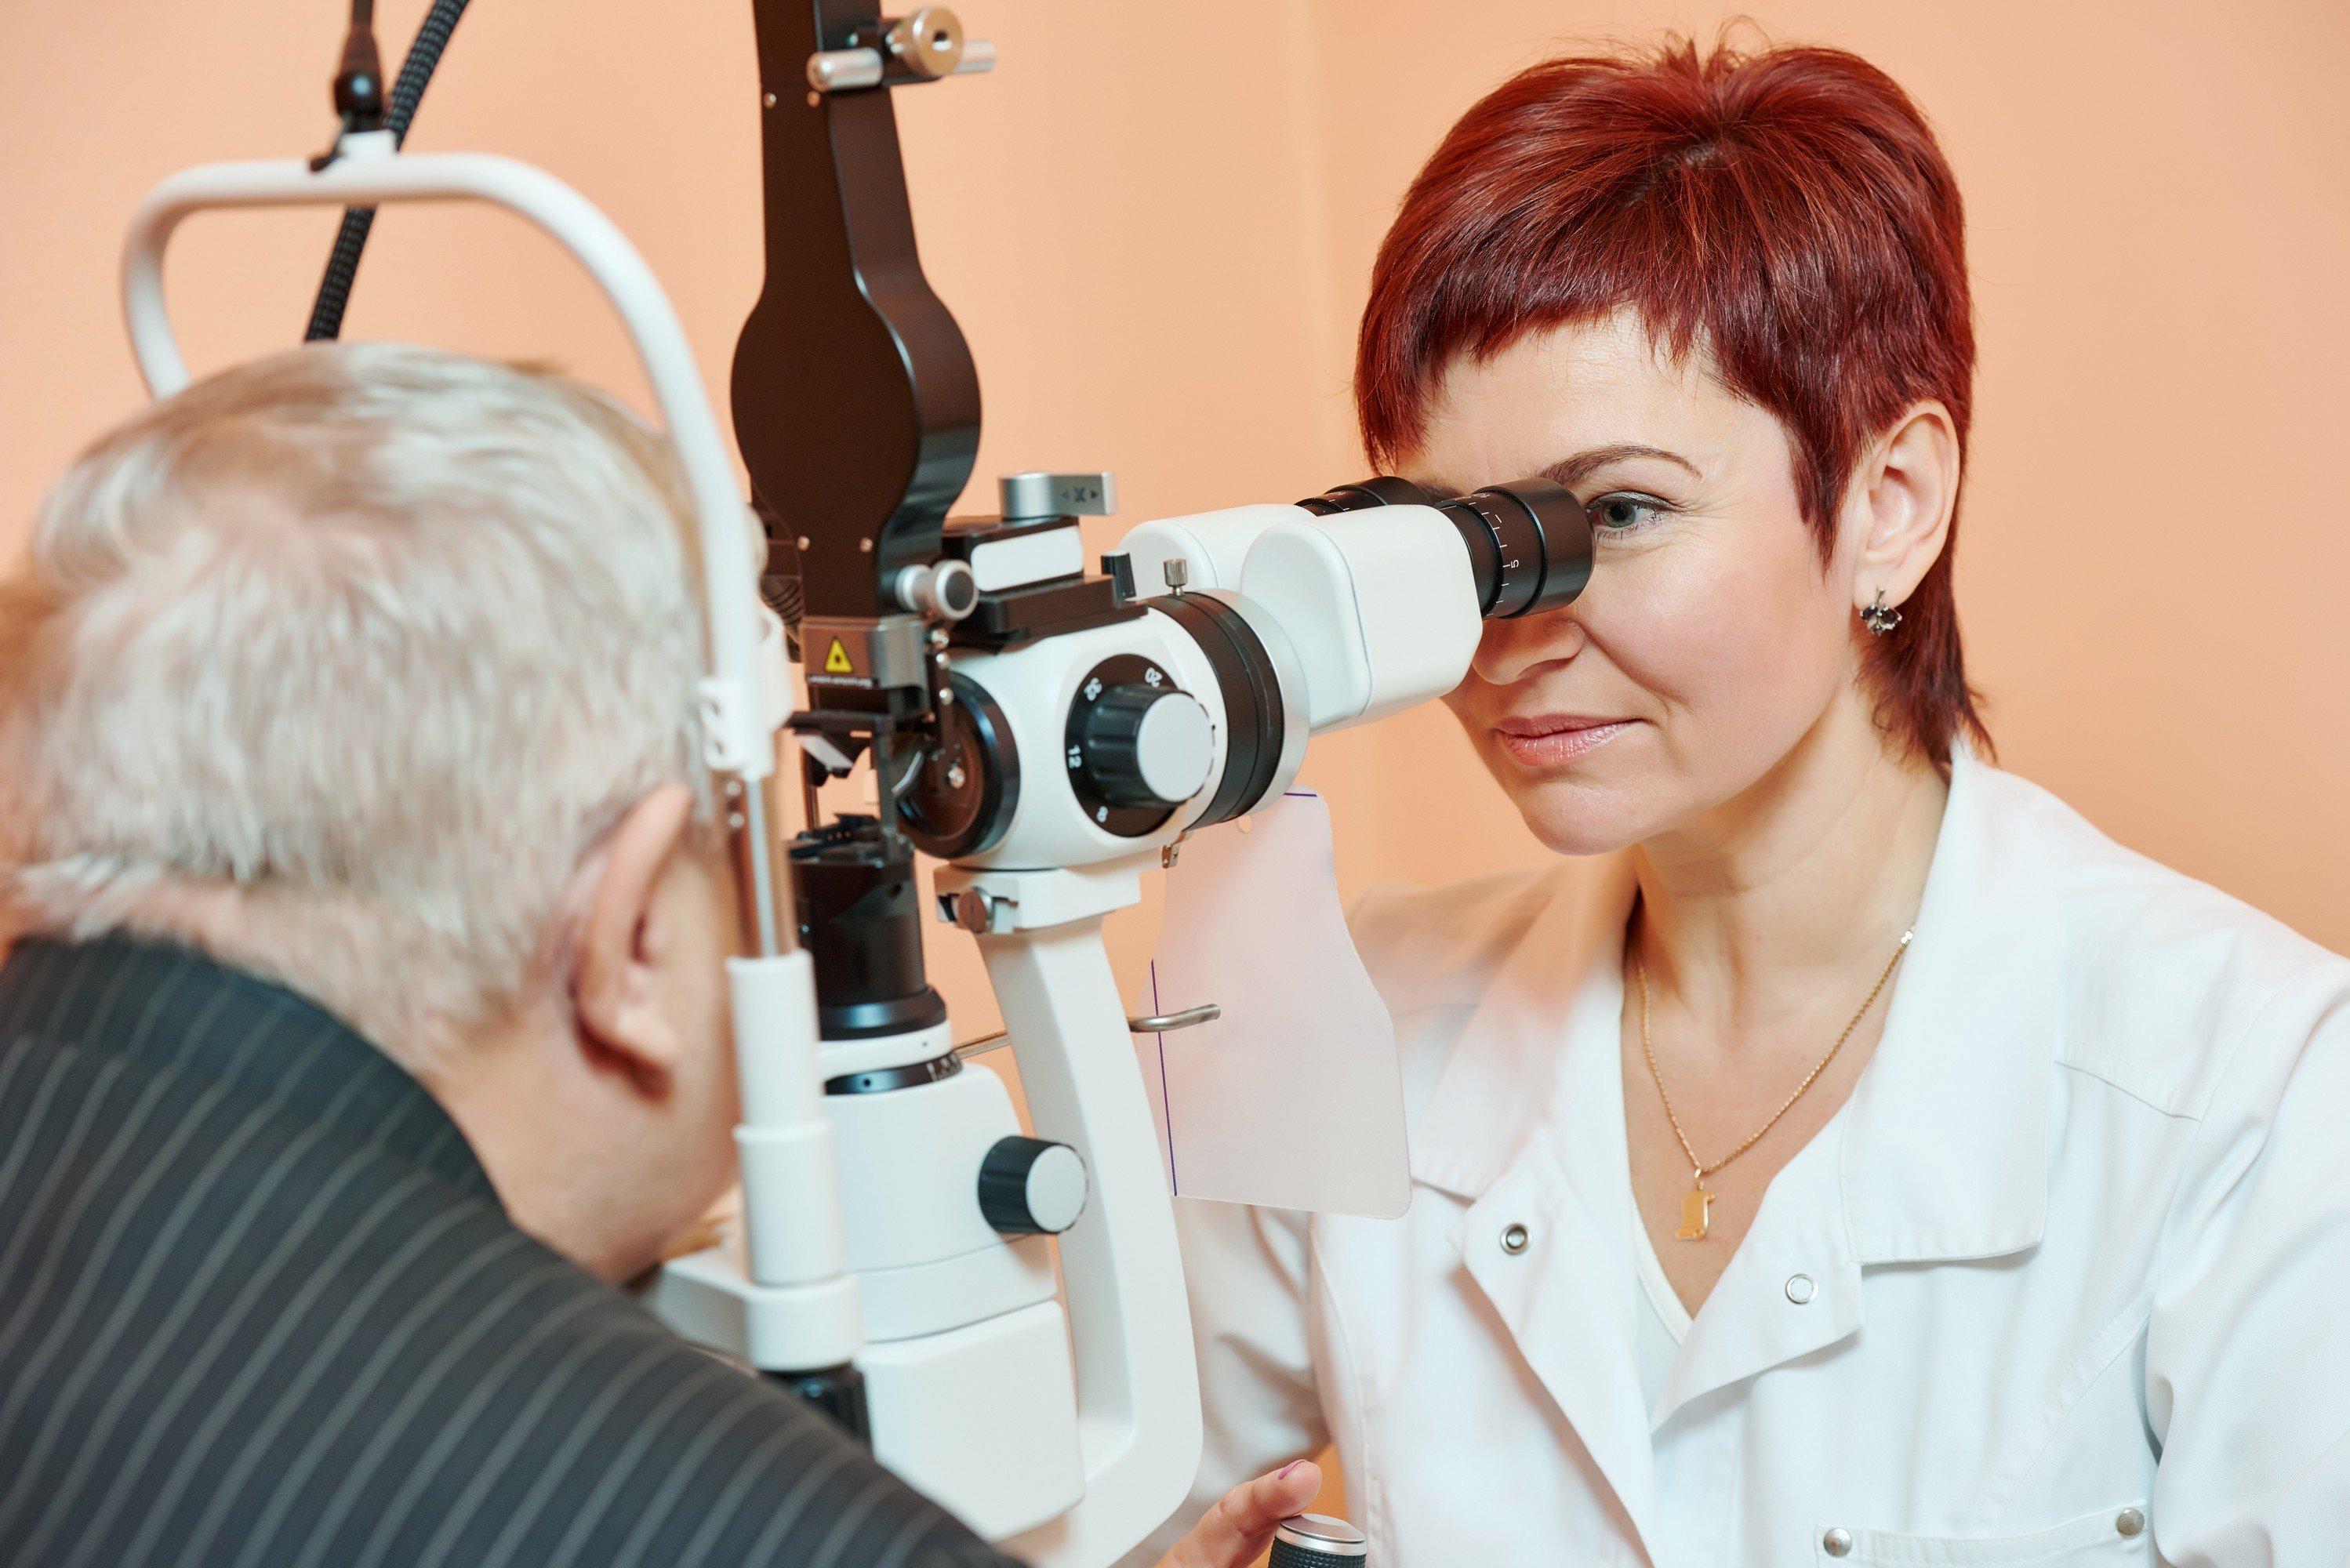 Optometrist vs ophthalmologist